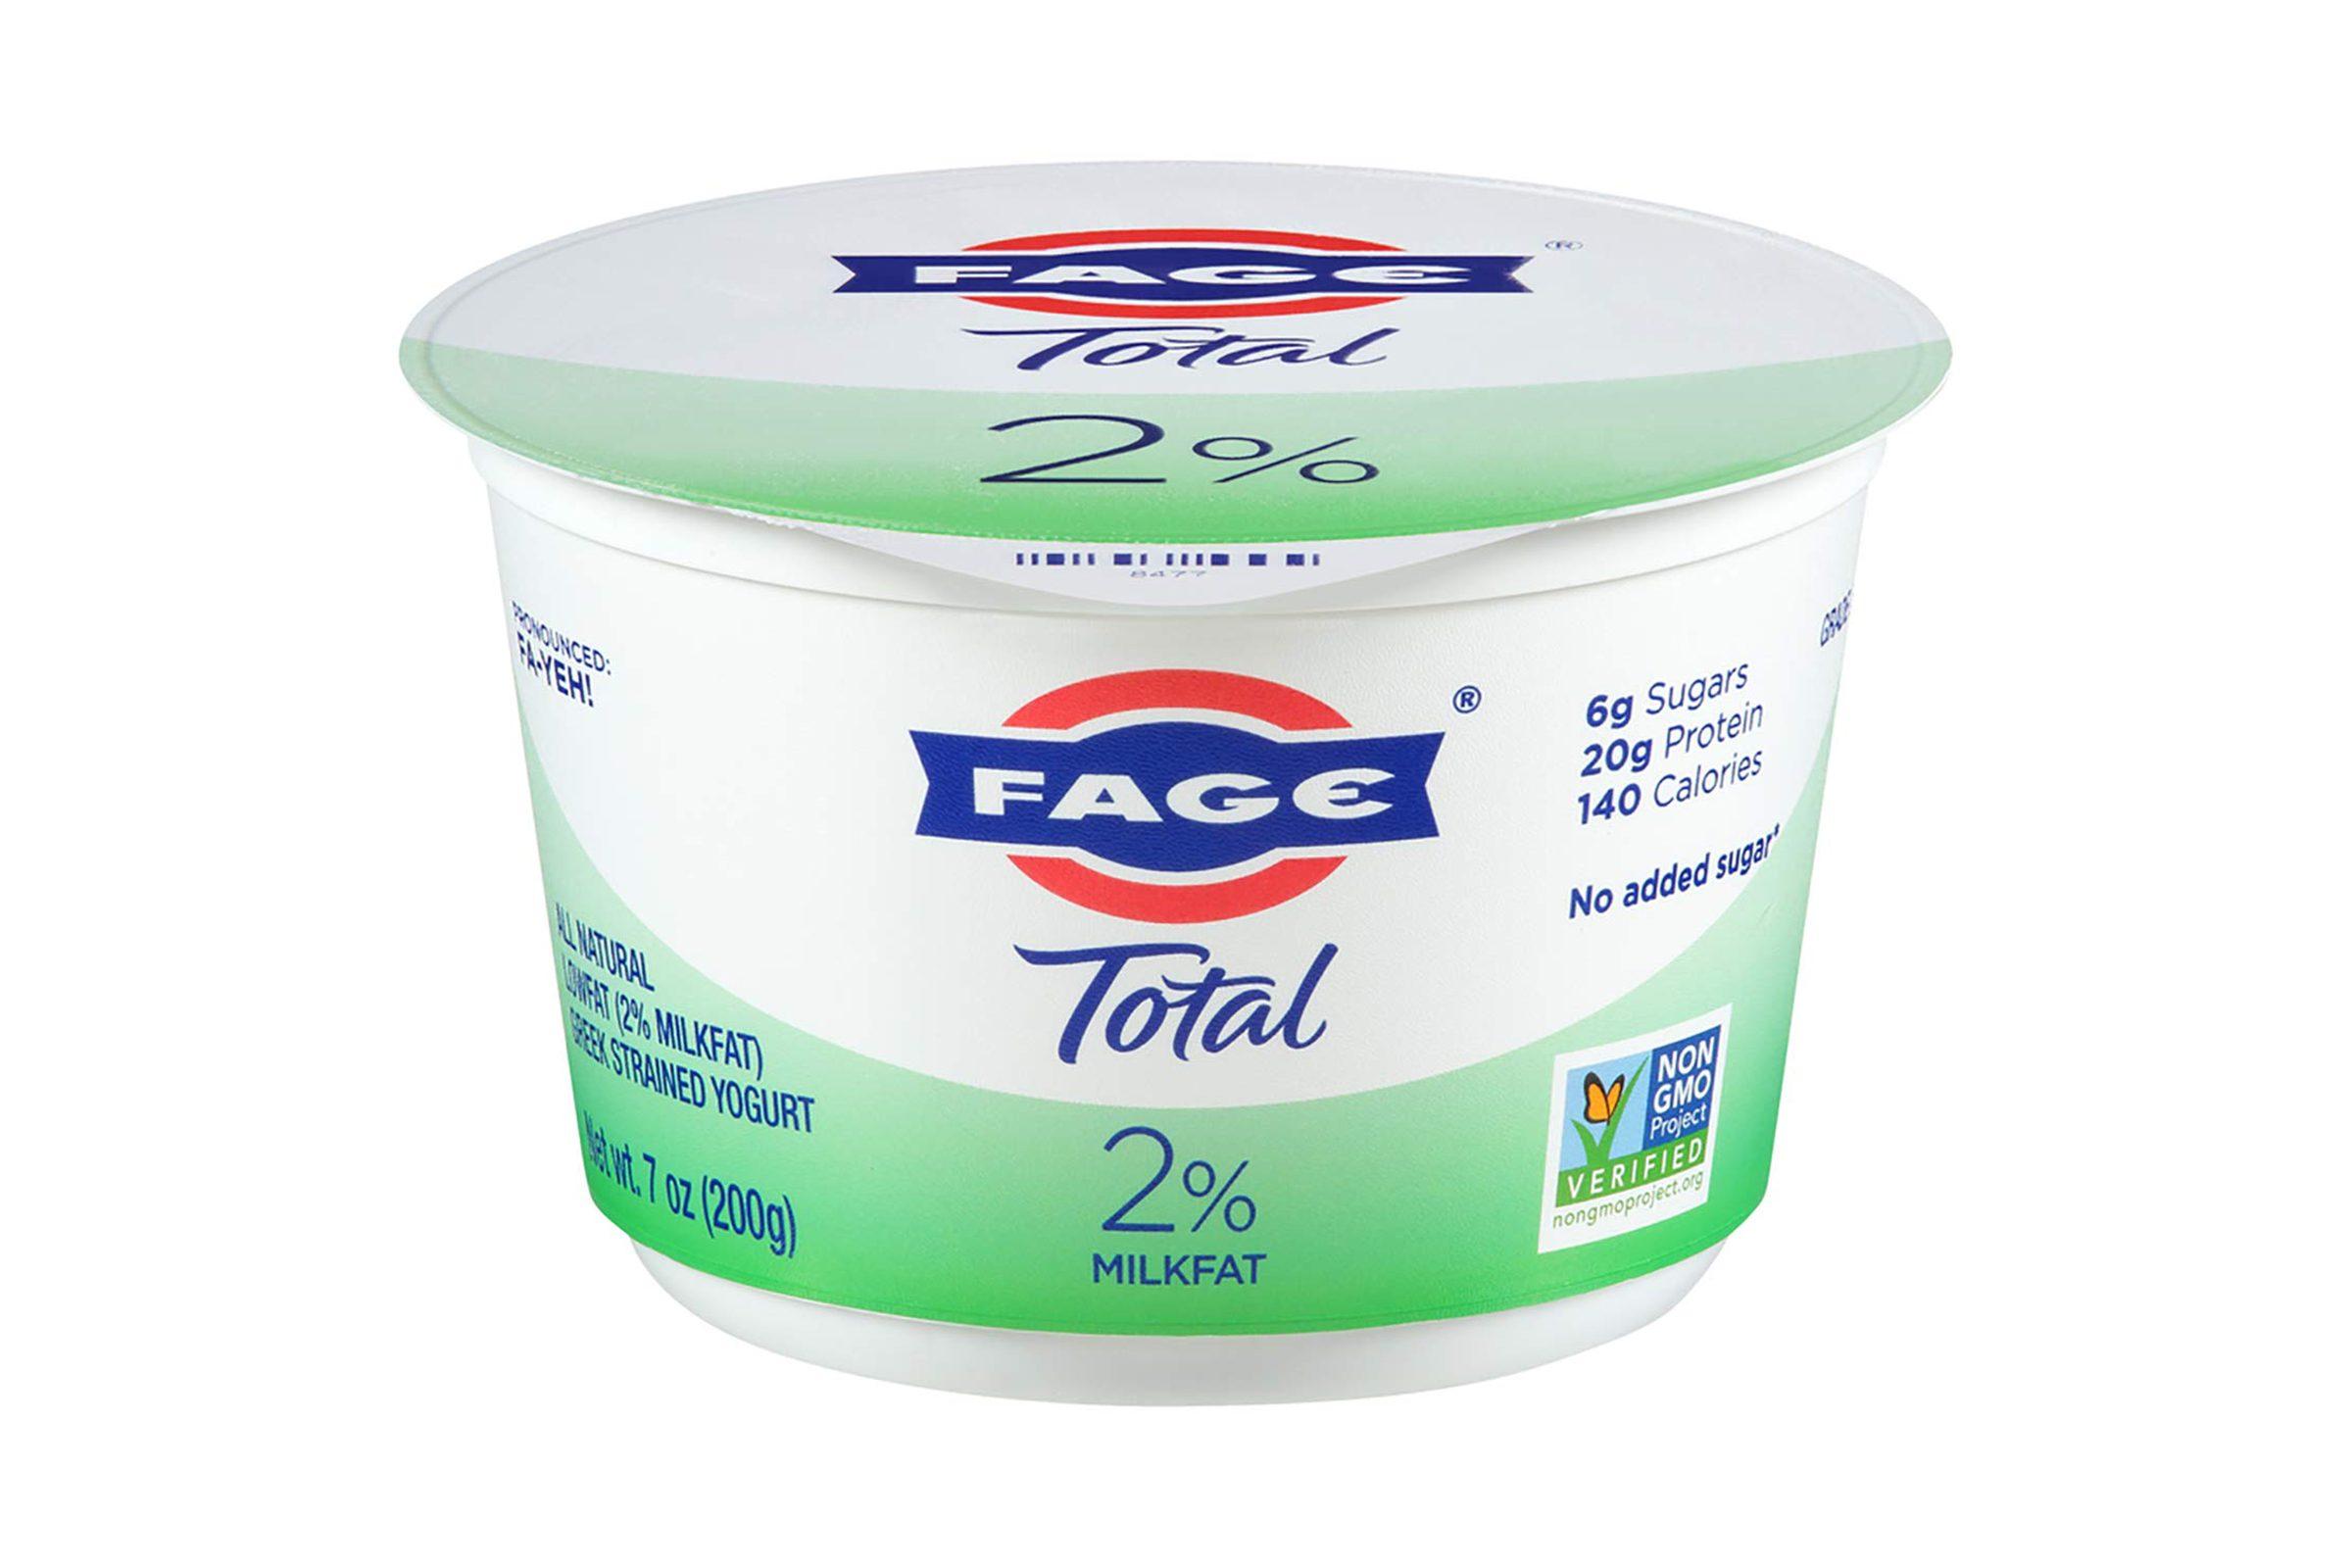 fage total greek yogurt